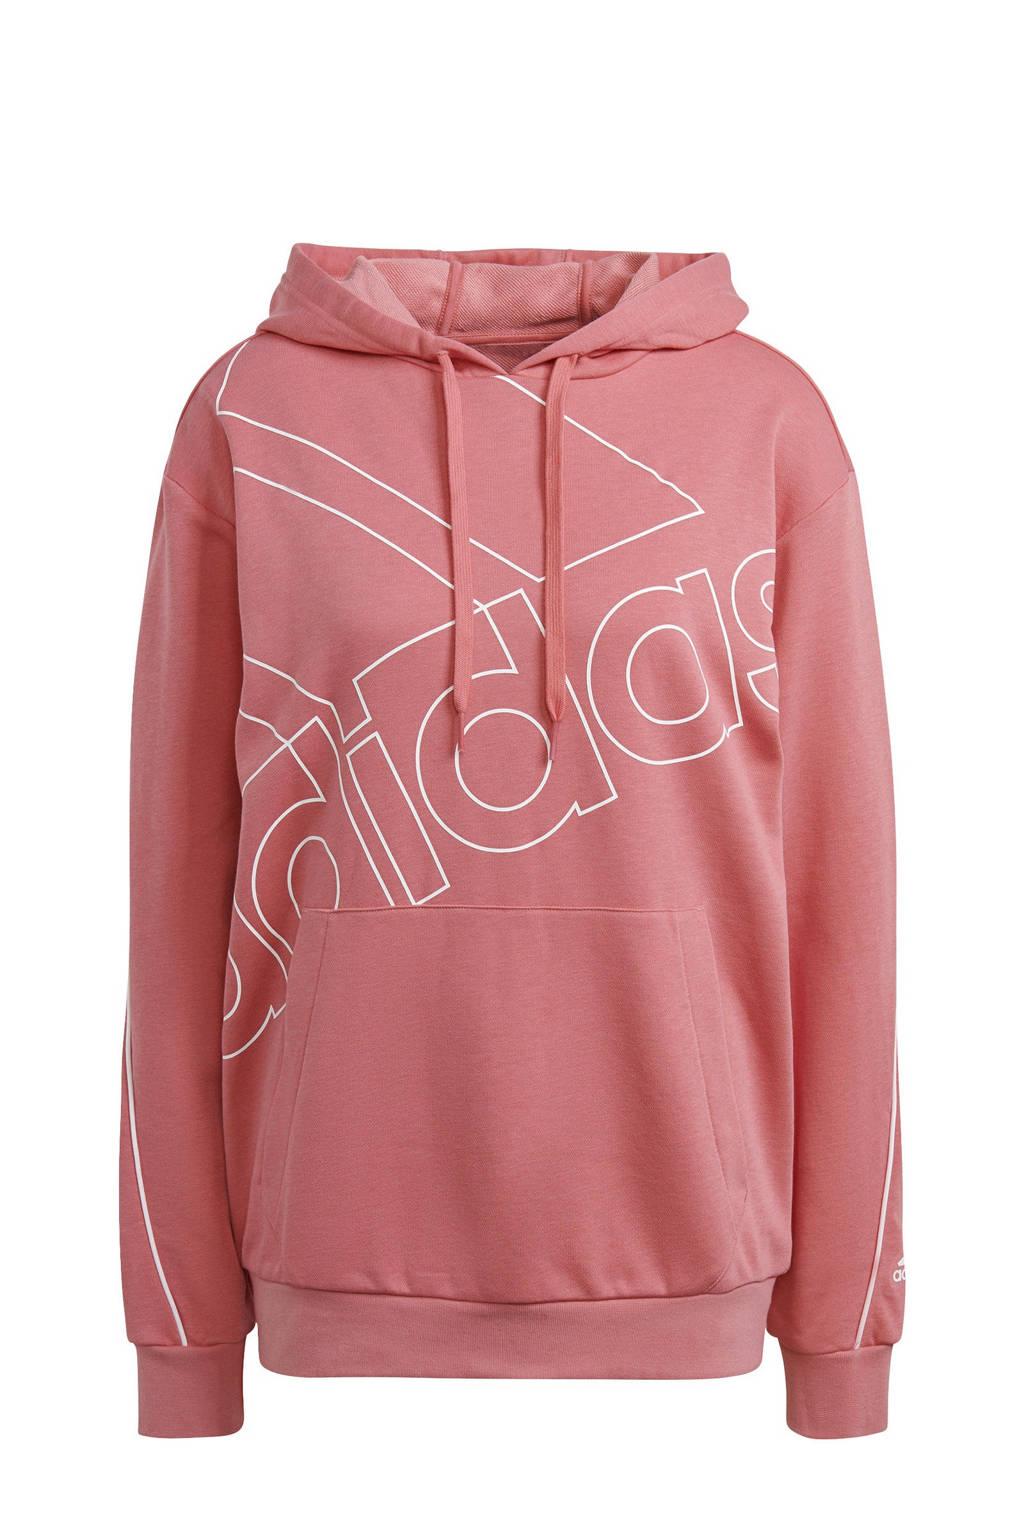 adidas Performance oversized logo sportsweater lichtroze/wit, Lichtroze/wit